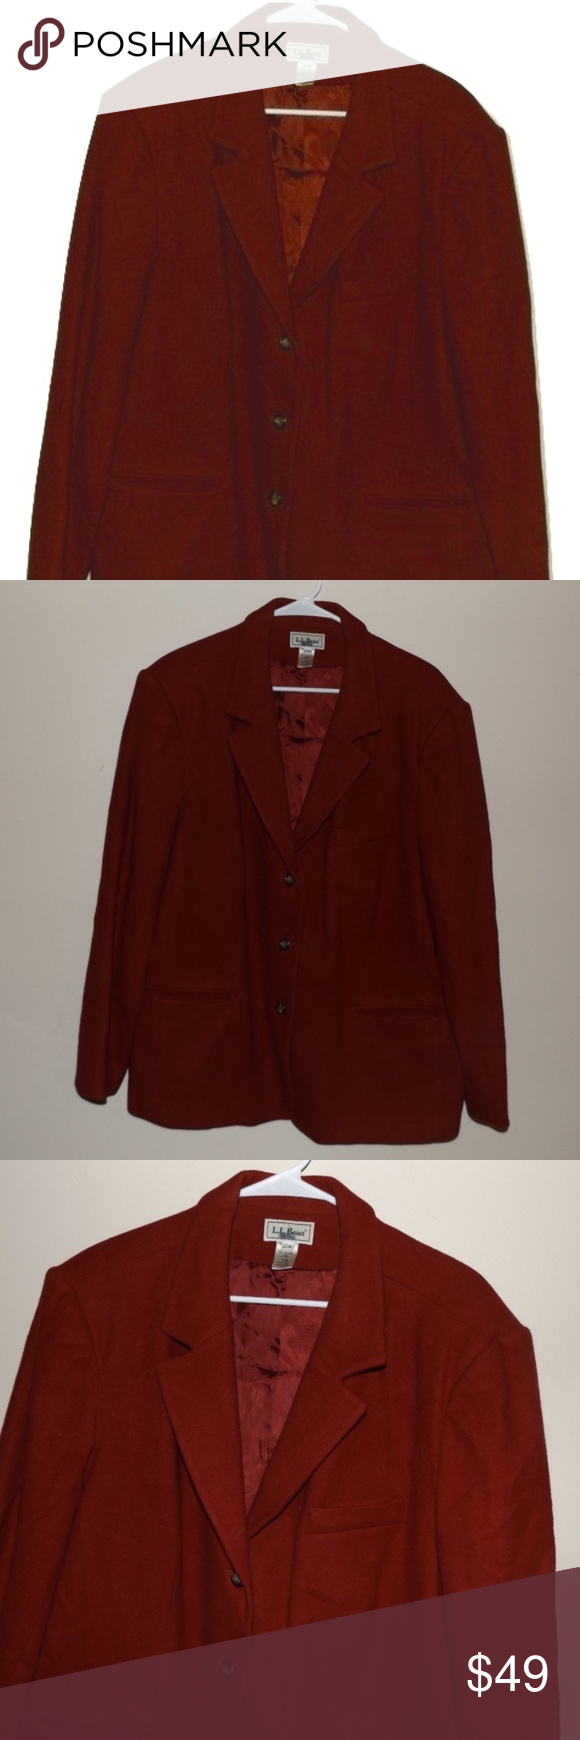 a38ead99765 L.L. Bean Womens Plus Size 22W Vintage Red Blazer L.L. Bean Womens Plus  Size 22W Vintage